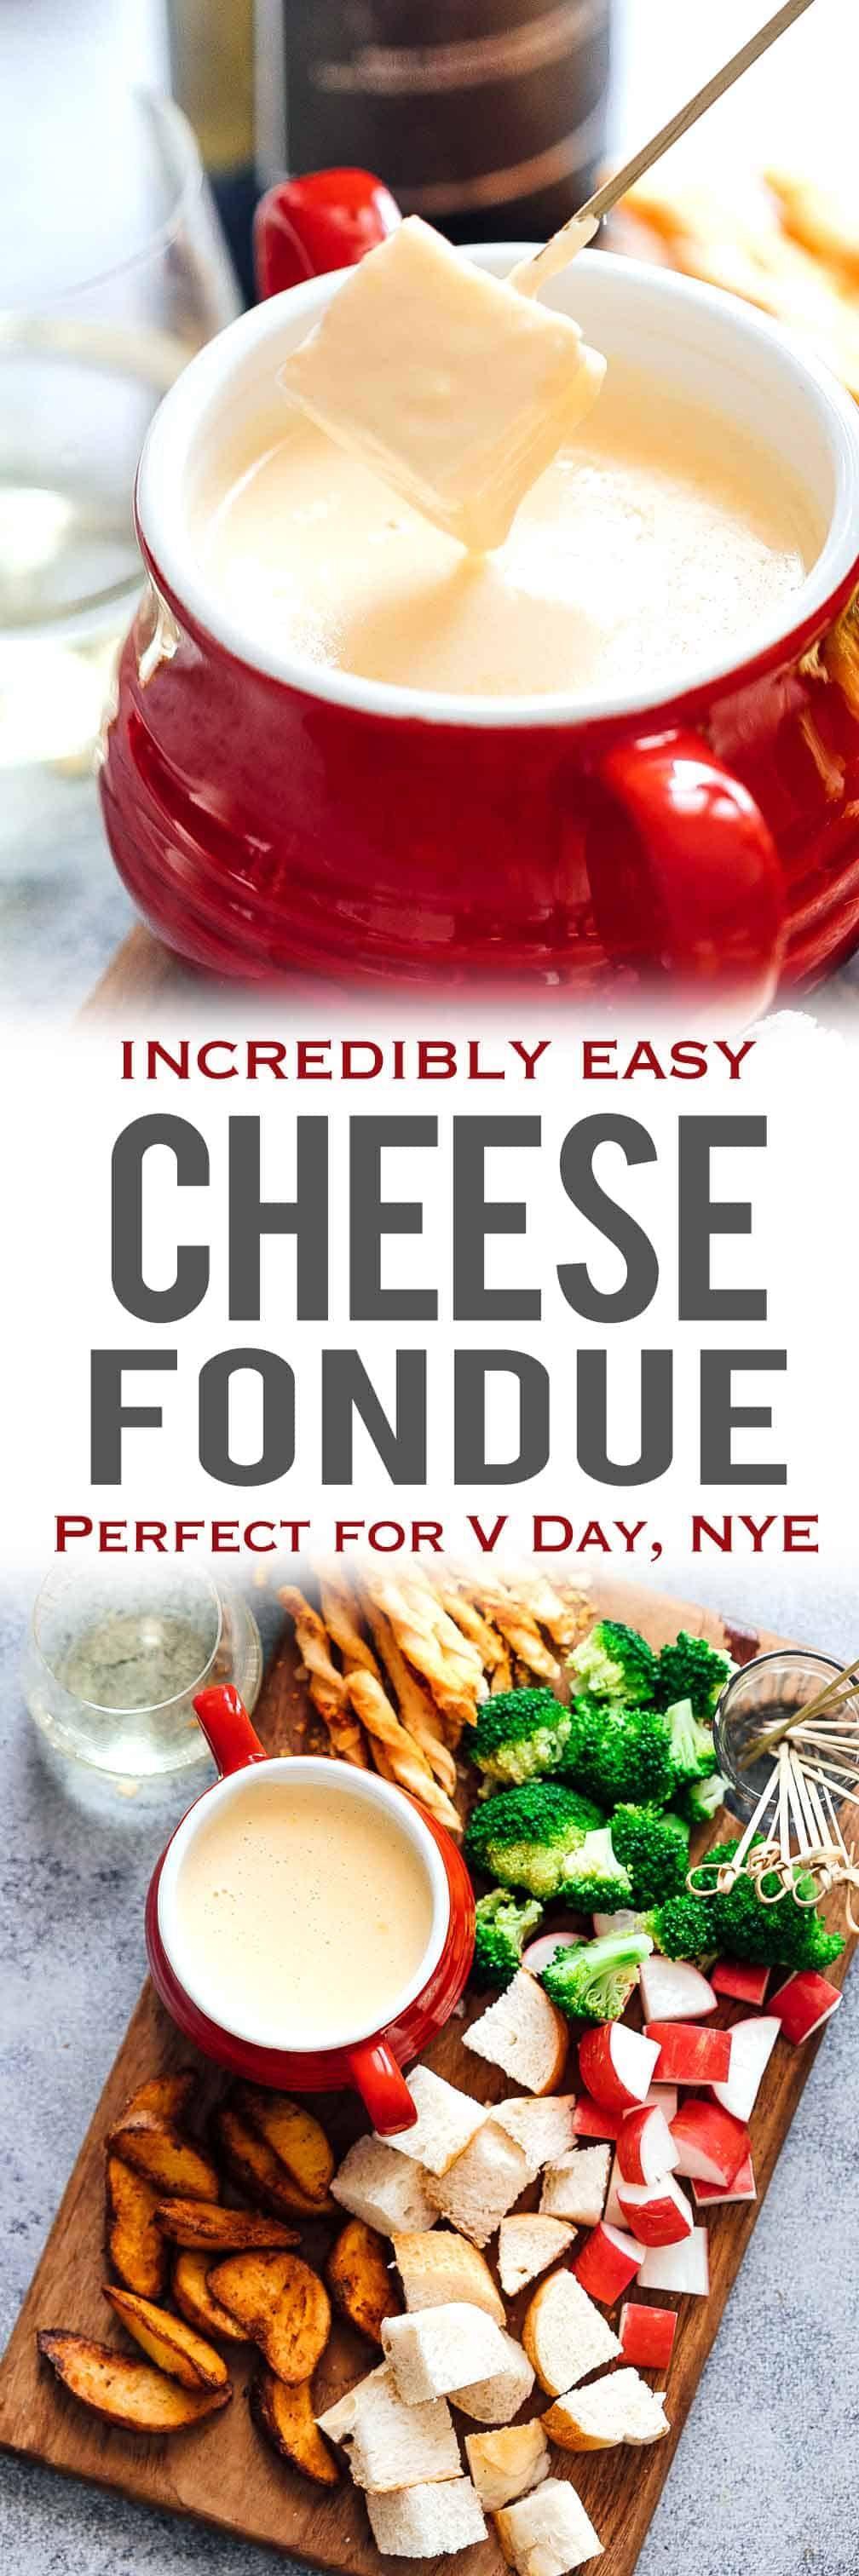 Easy Cheese Fondue Recipe With White Wine Recipe Fondue Recipes Cheese Easy Cheese Fondue Fondue Dinner